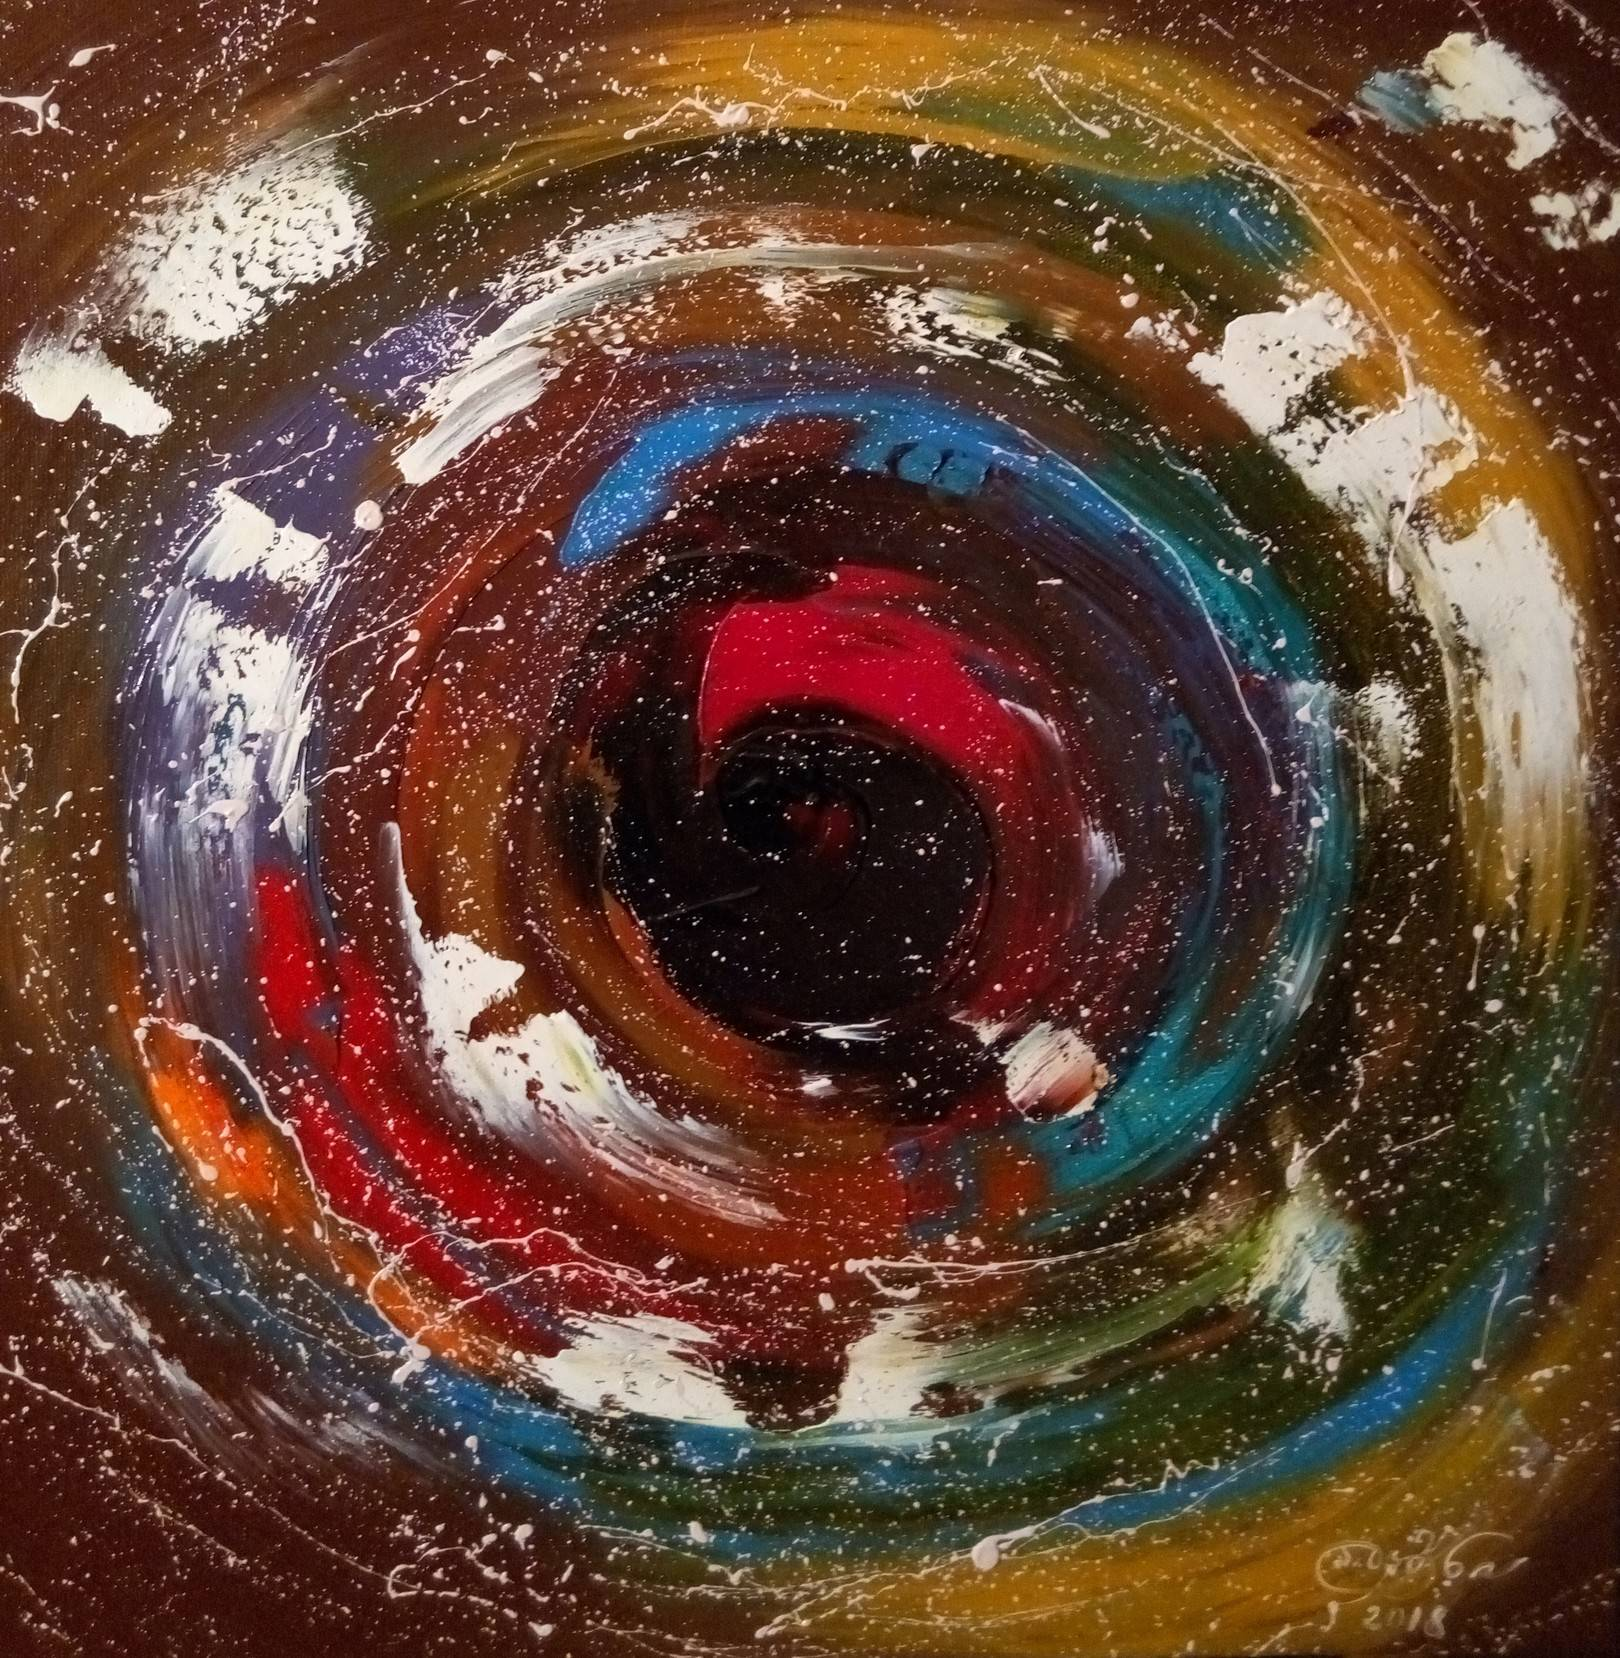 «Взгляд в подсознание»        холст, масло «Look in subconsciousness»   oil on canvas  50x50,  2018